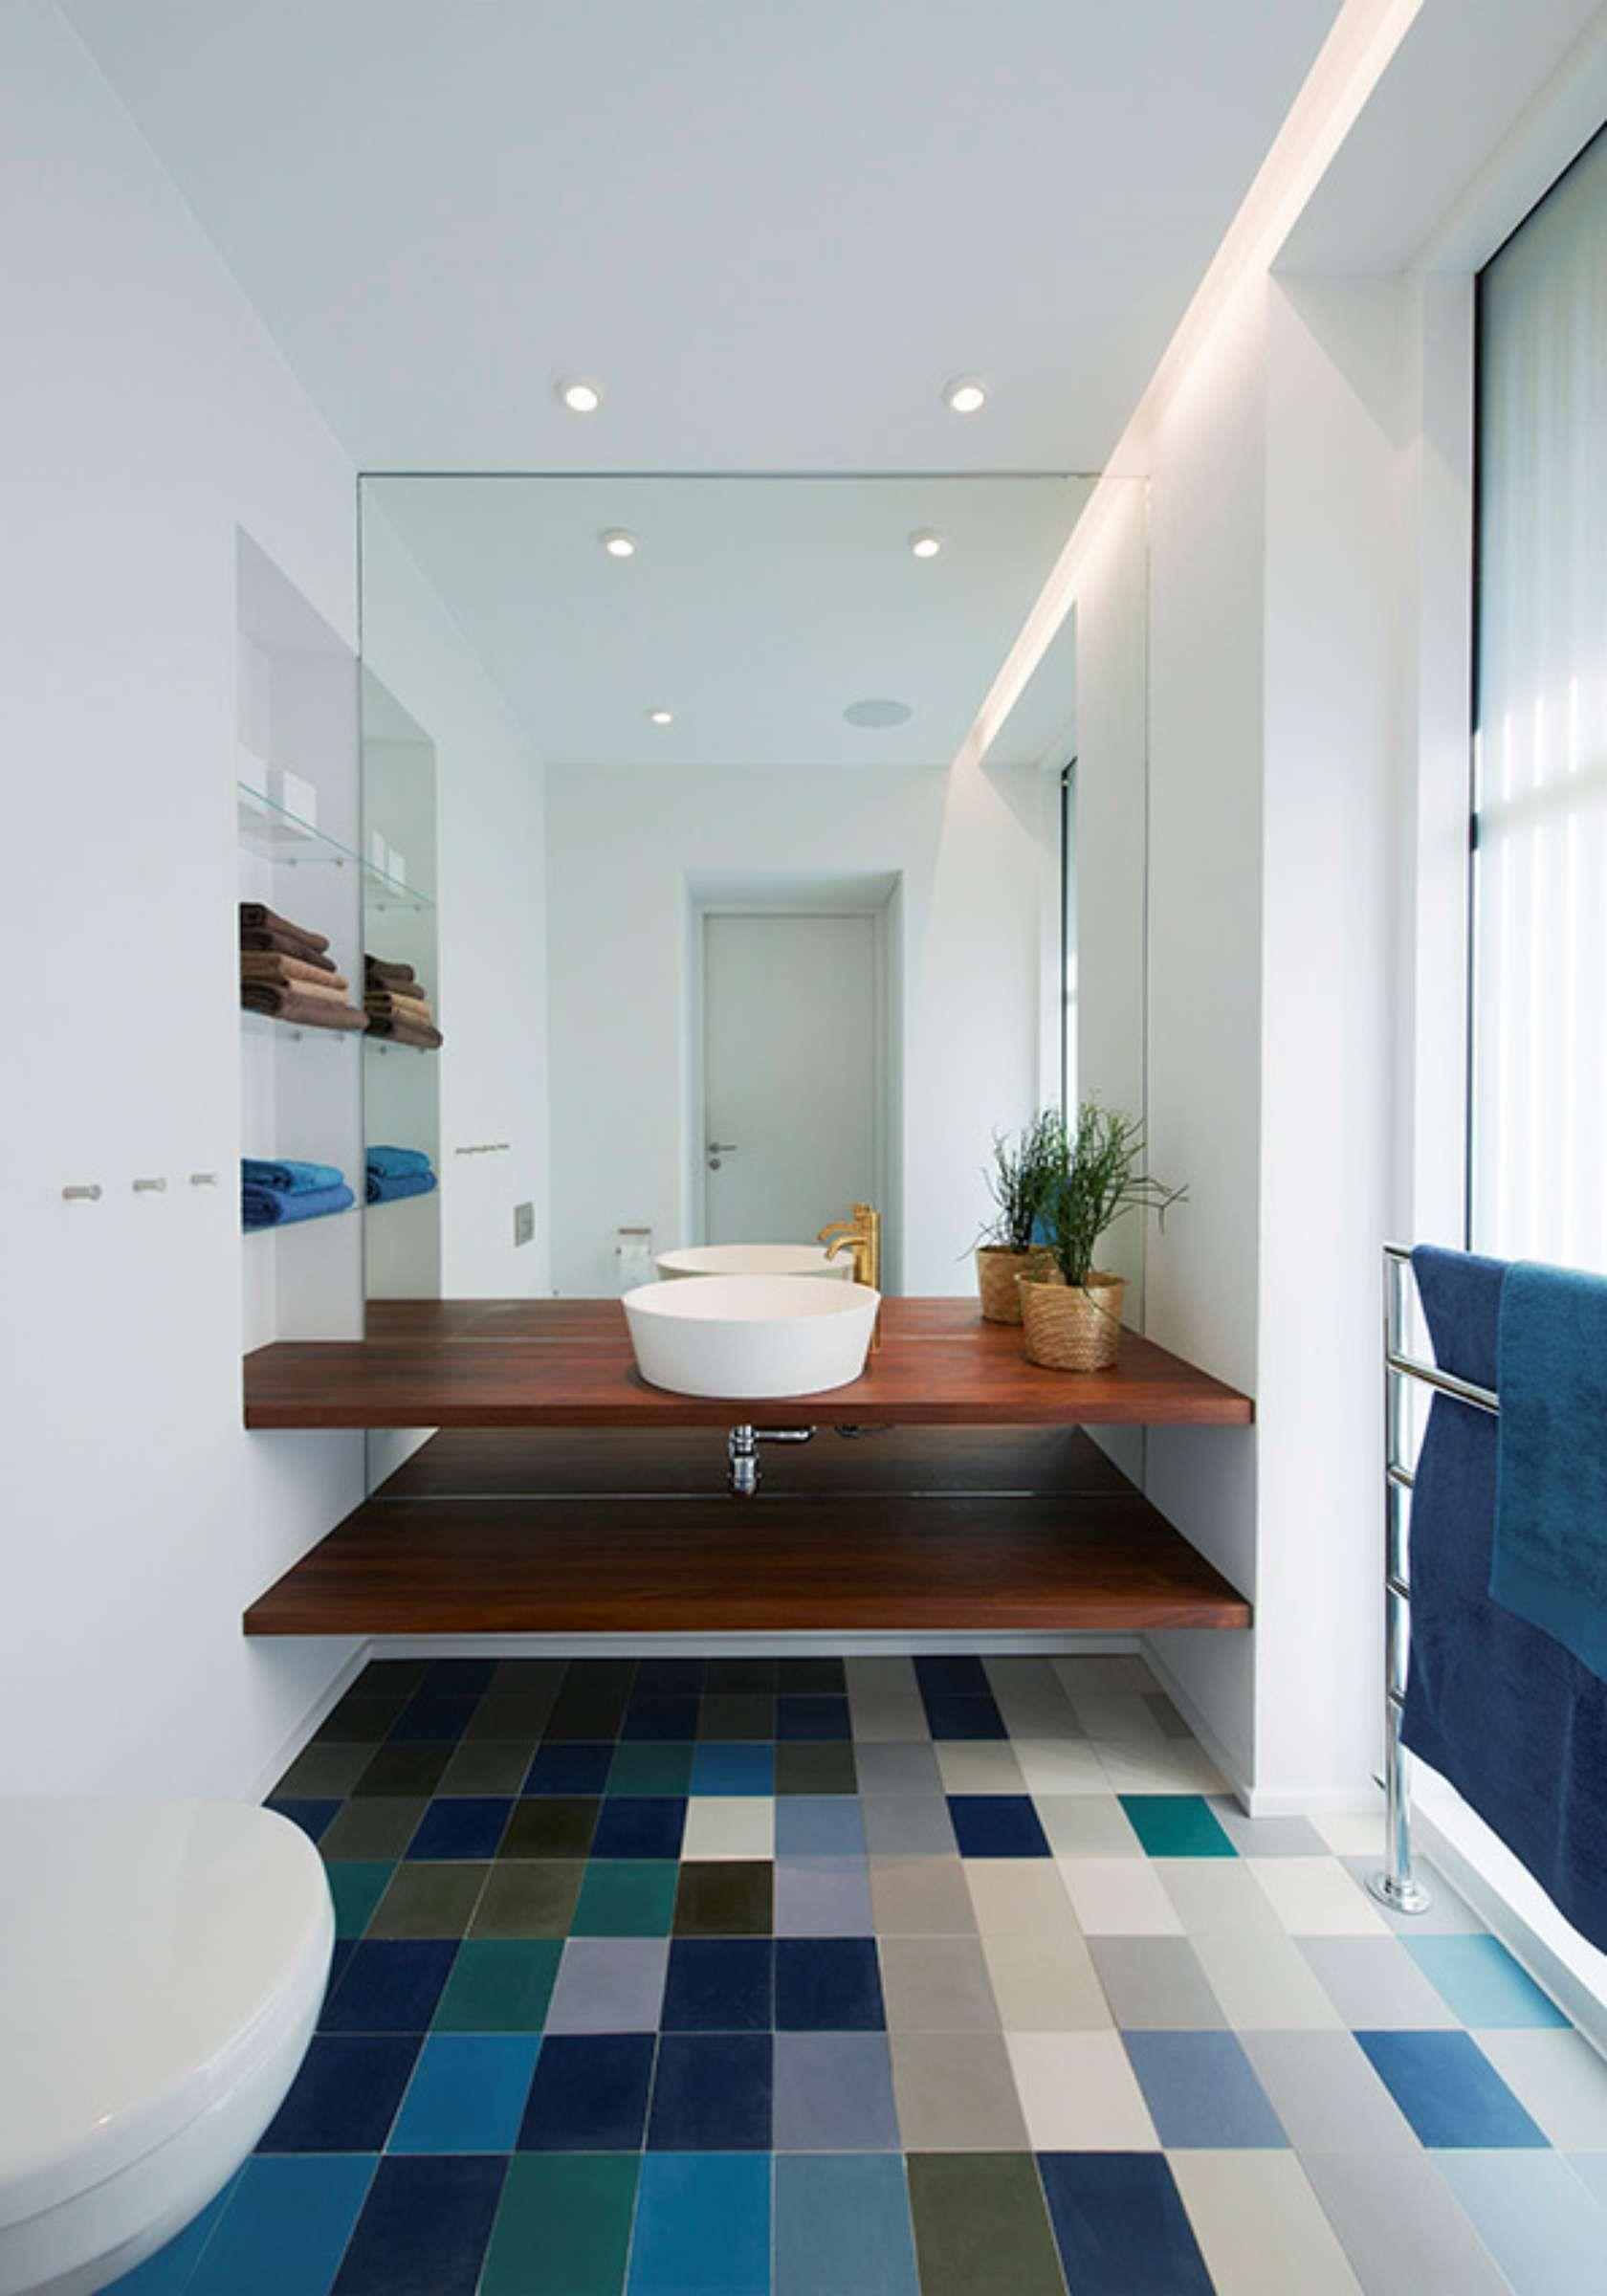 Master bedroom without bathroom  efcccebbcfcecg   Wc  Pinterest